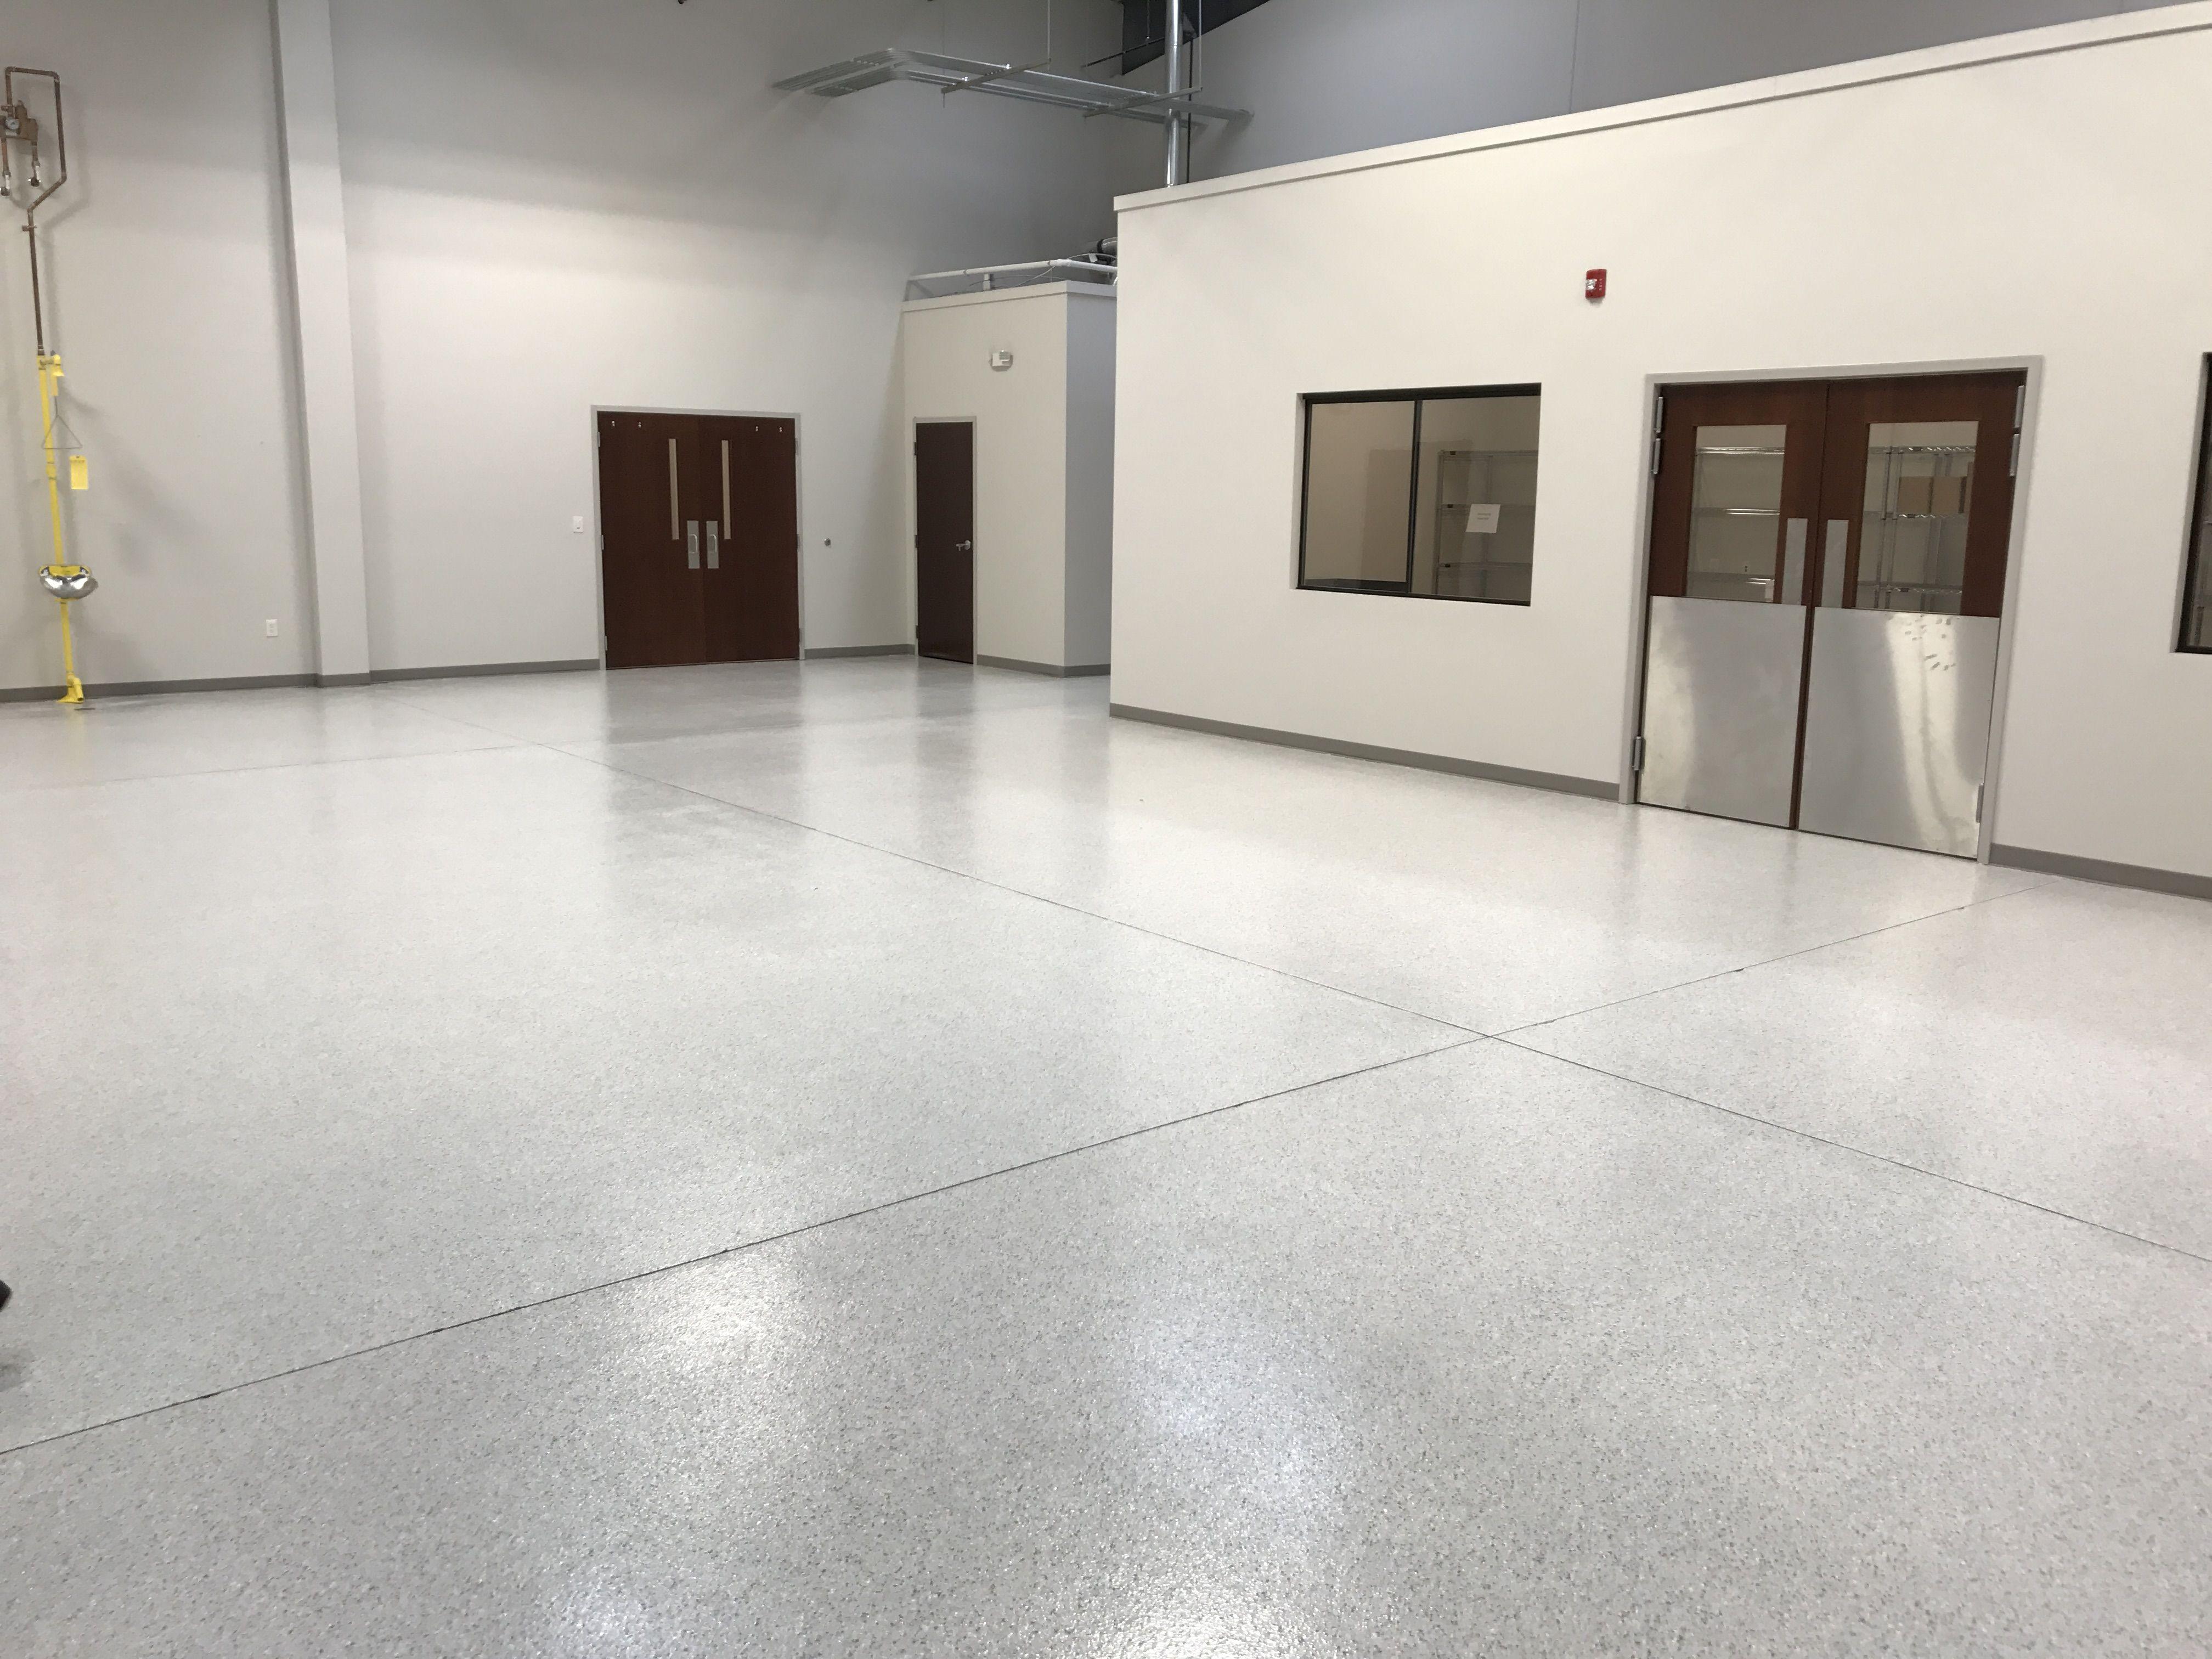 3000 SF flooring Flooring, Garage organization, Tile floor